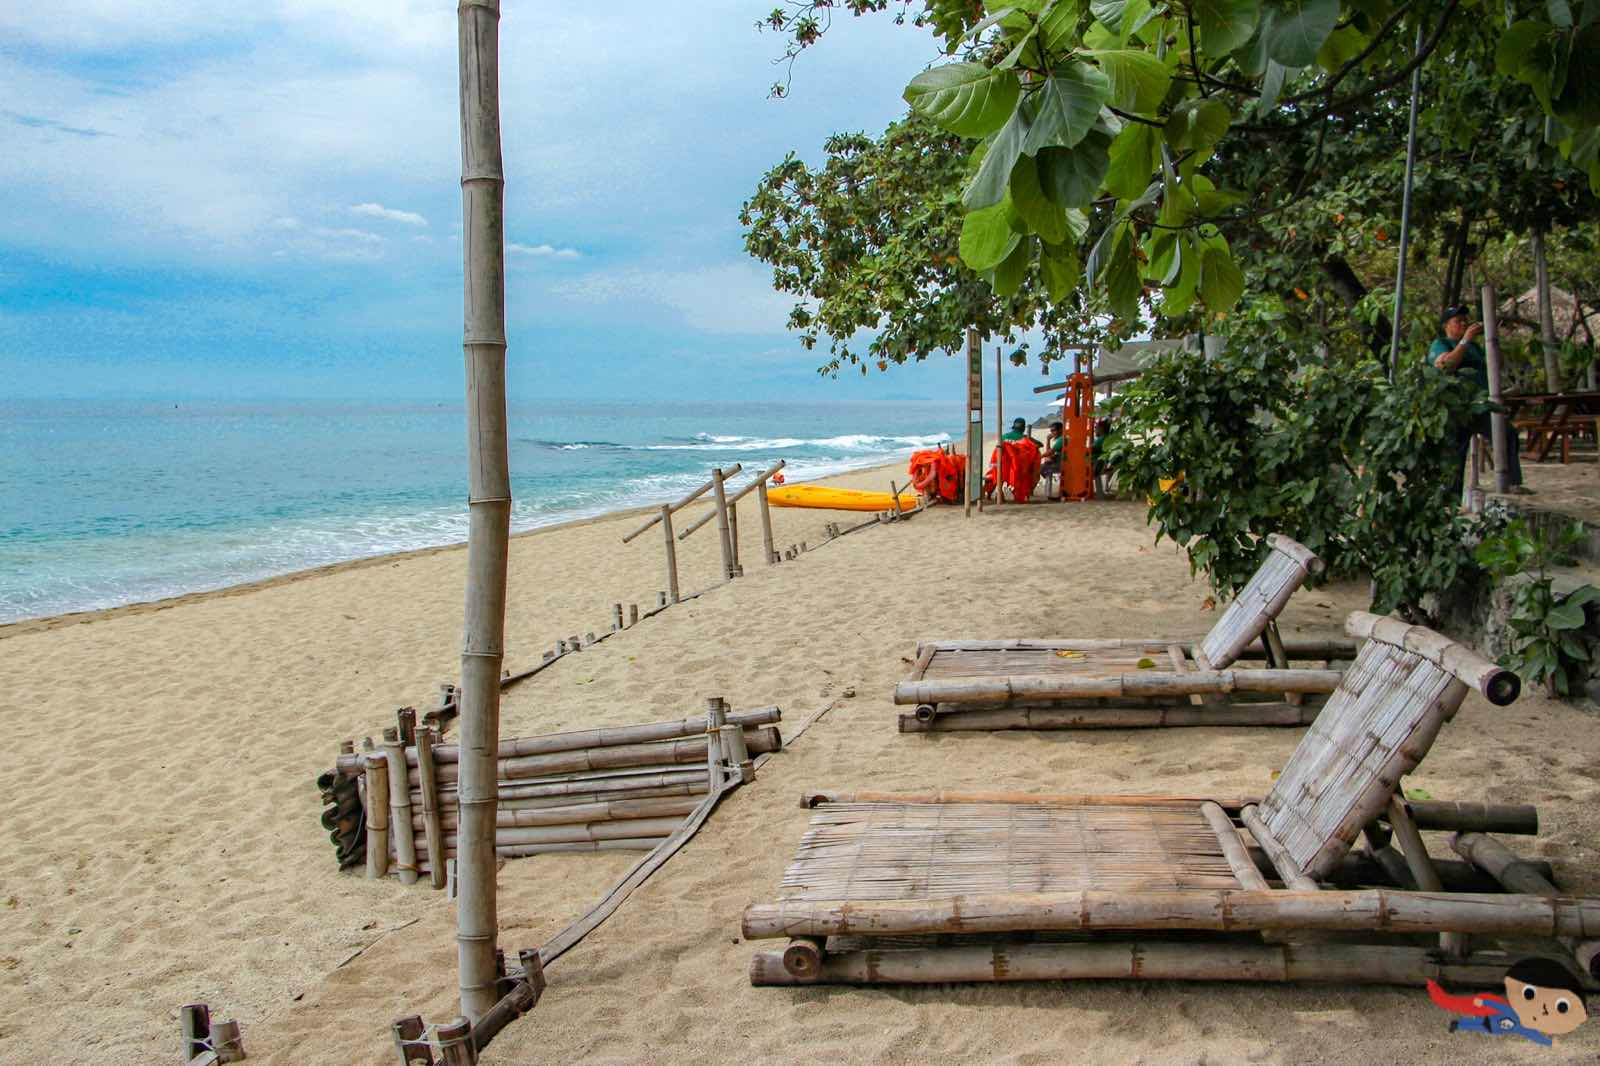 La Luz Beach Resort in Laiya, San Juan, Batangas